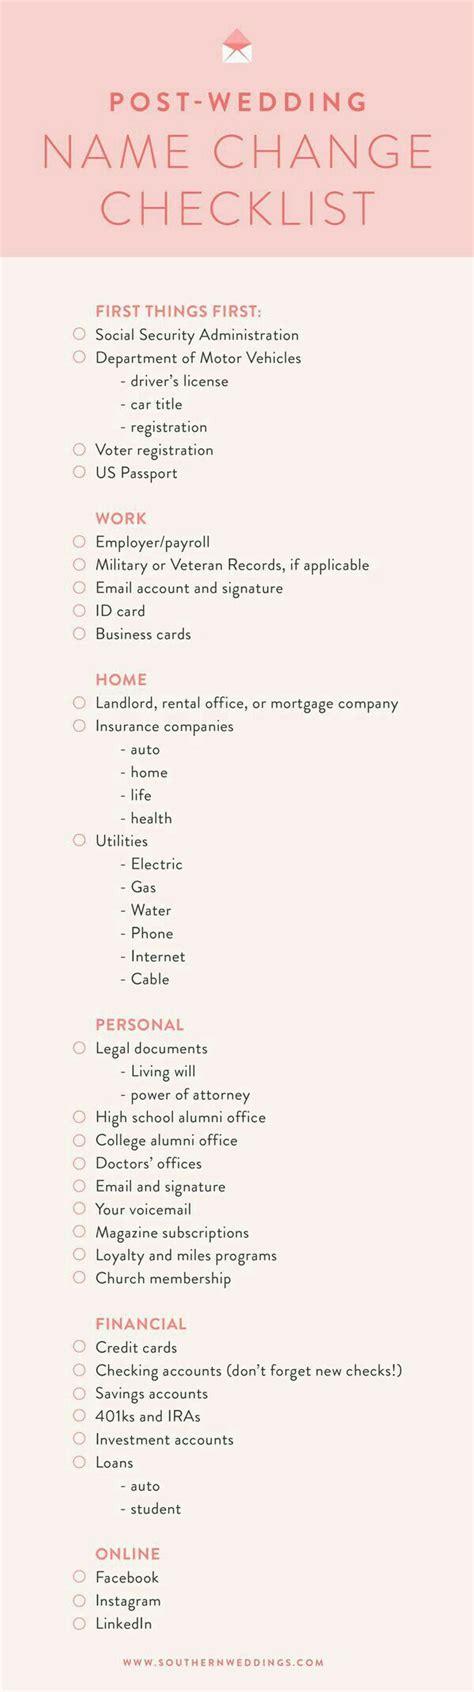 Wedding Checklist Name Change by Name Change Checklist Post Wedding Name